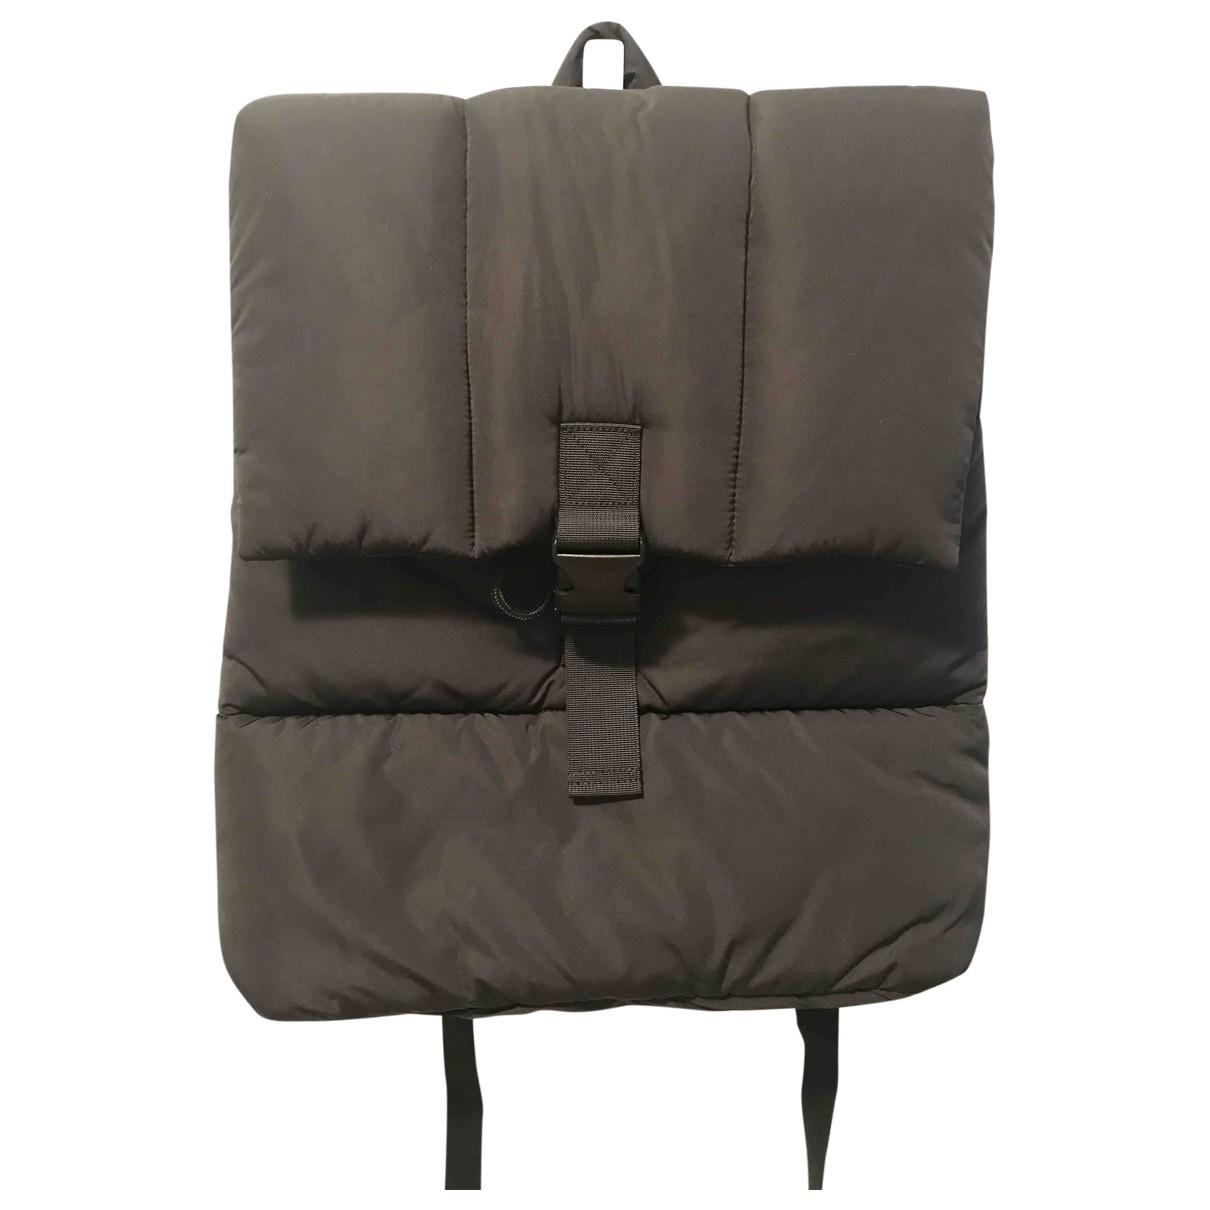 Marimekko N Black backpack for Women N